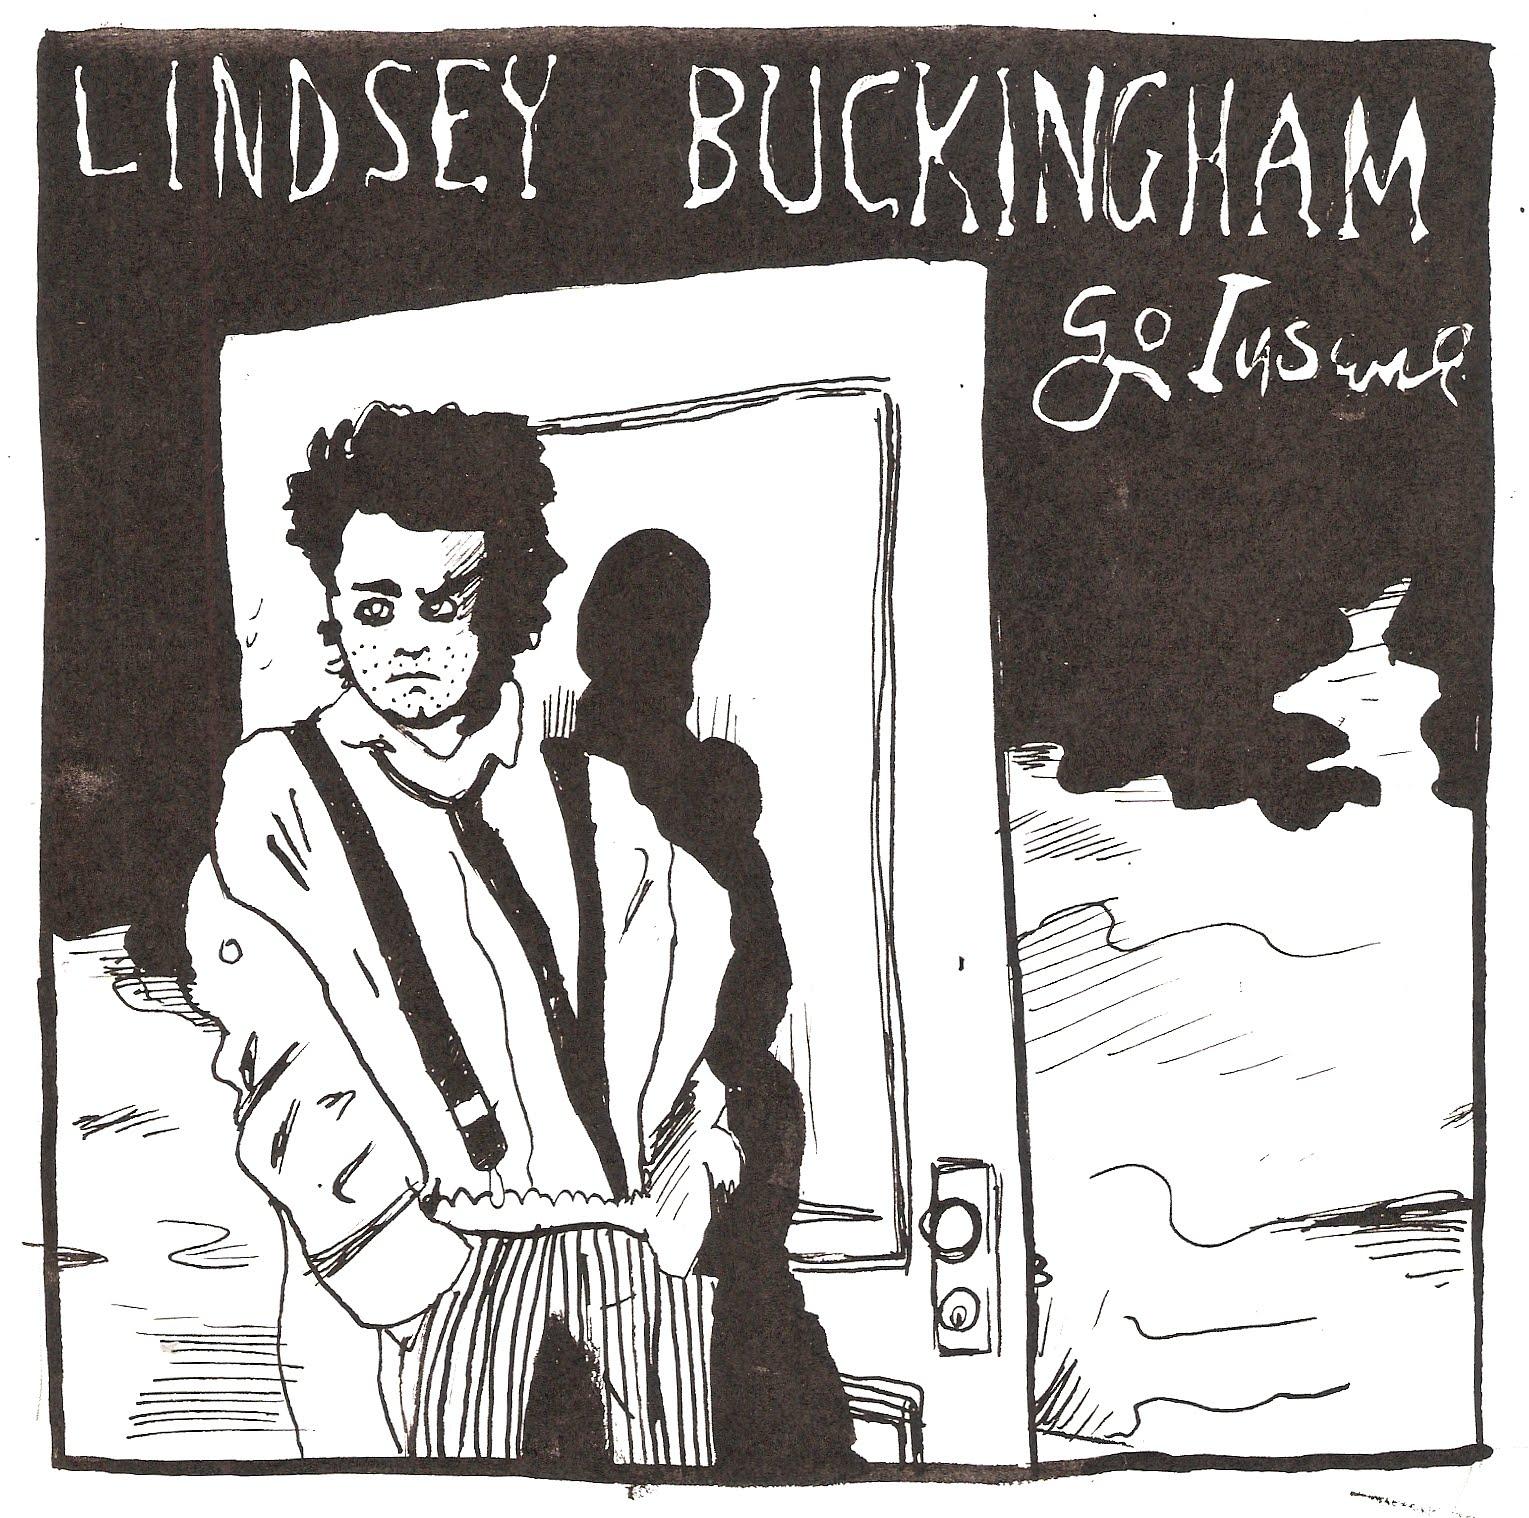 Robert Dayton: Lindsey Buckingham- Go Insane